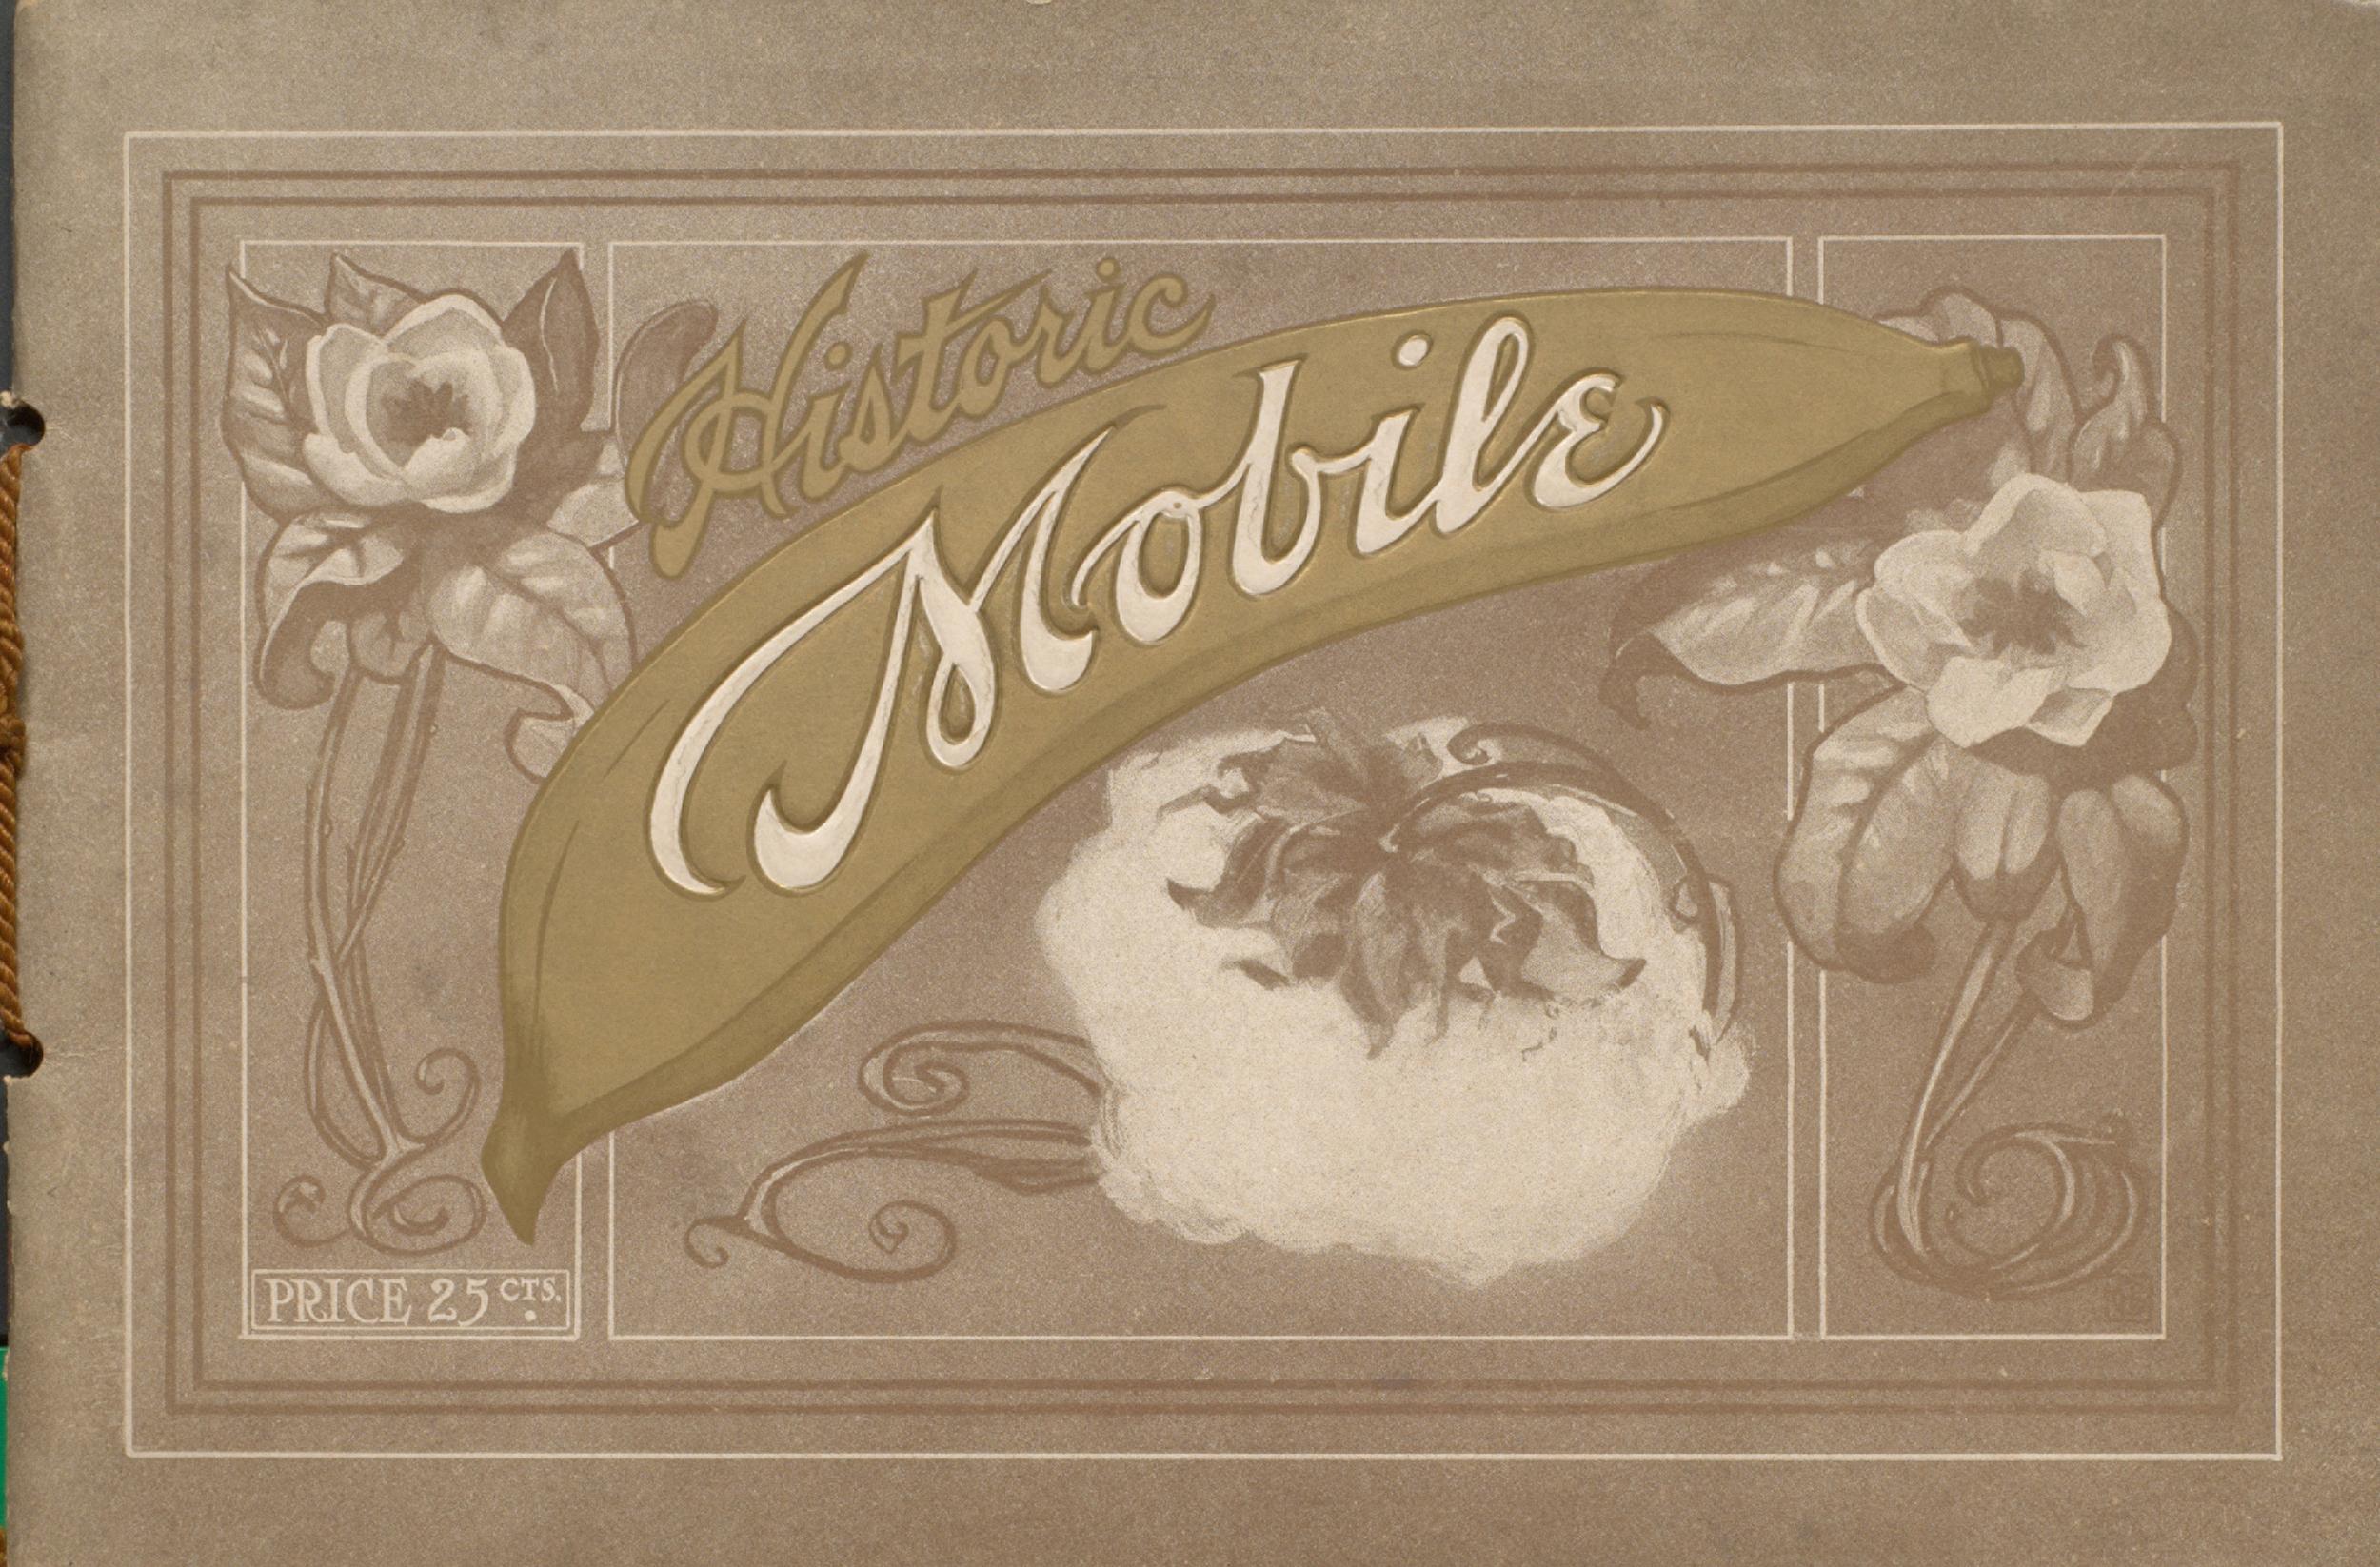 Cutter's Souvenir of Mobile, Alabama. Cover.